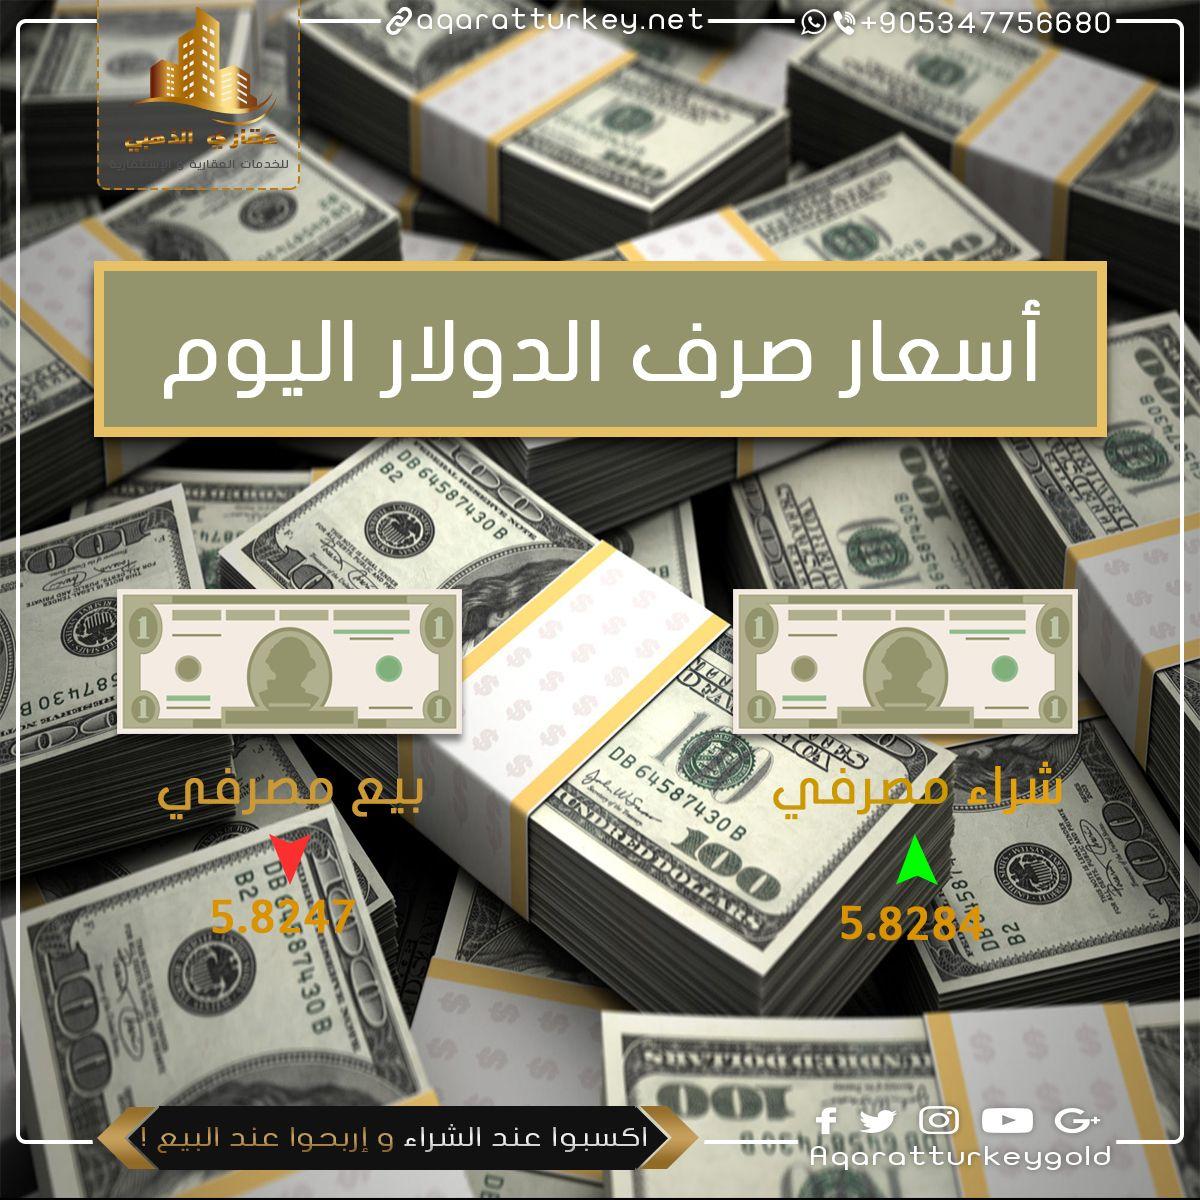 اسعار صرف الدولار اليوم Personalized Items Monopoly Deal Dollar